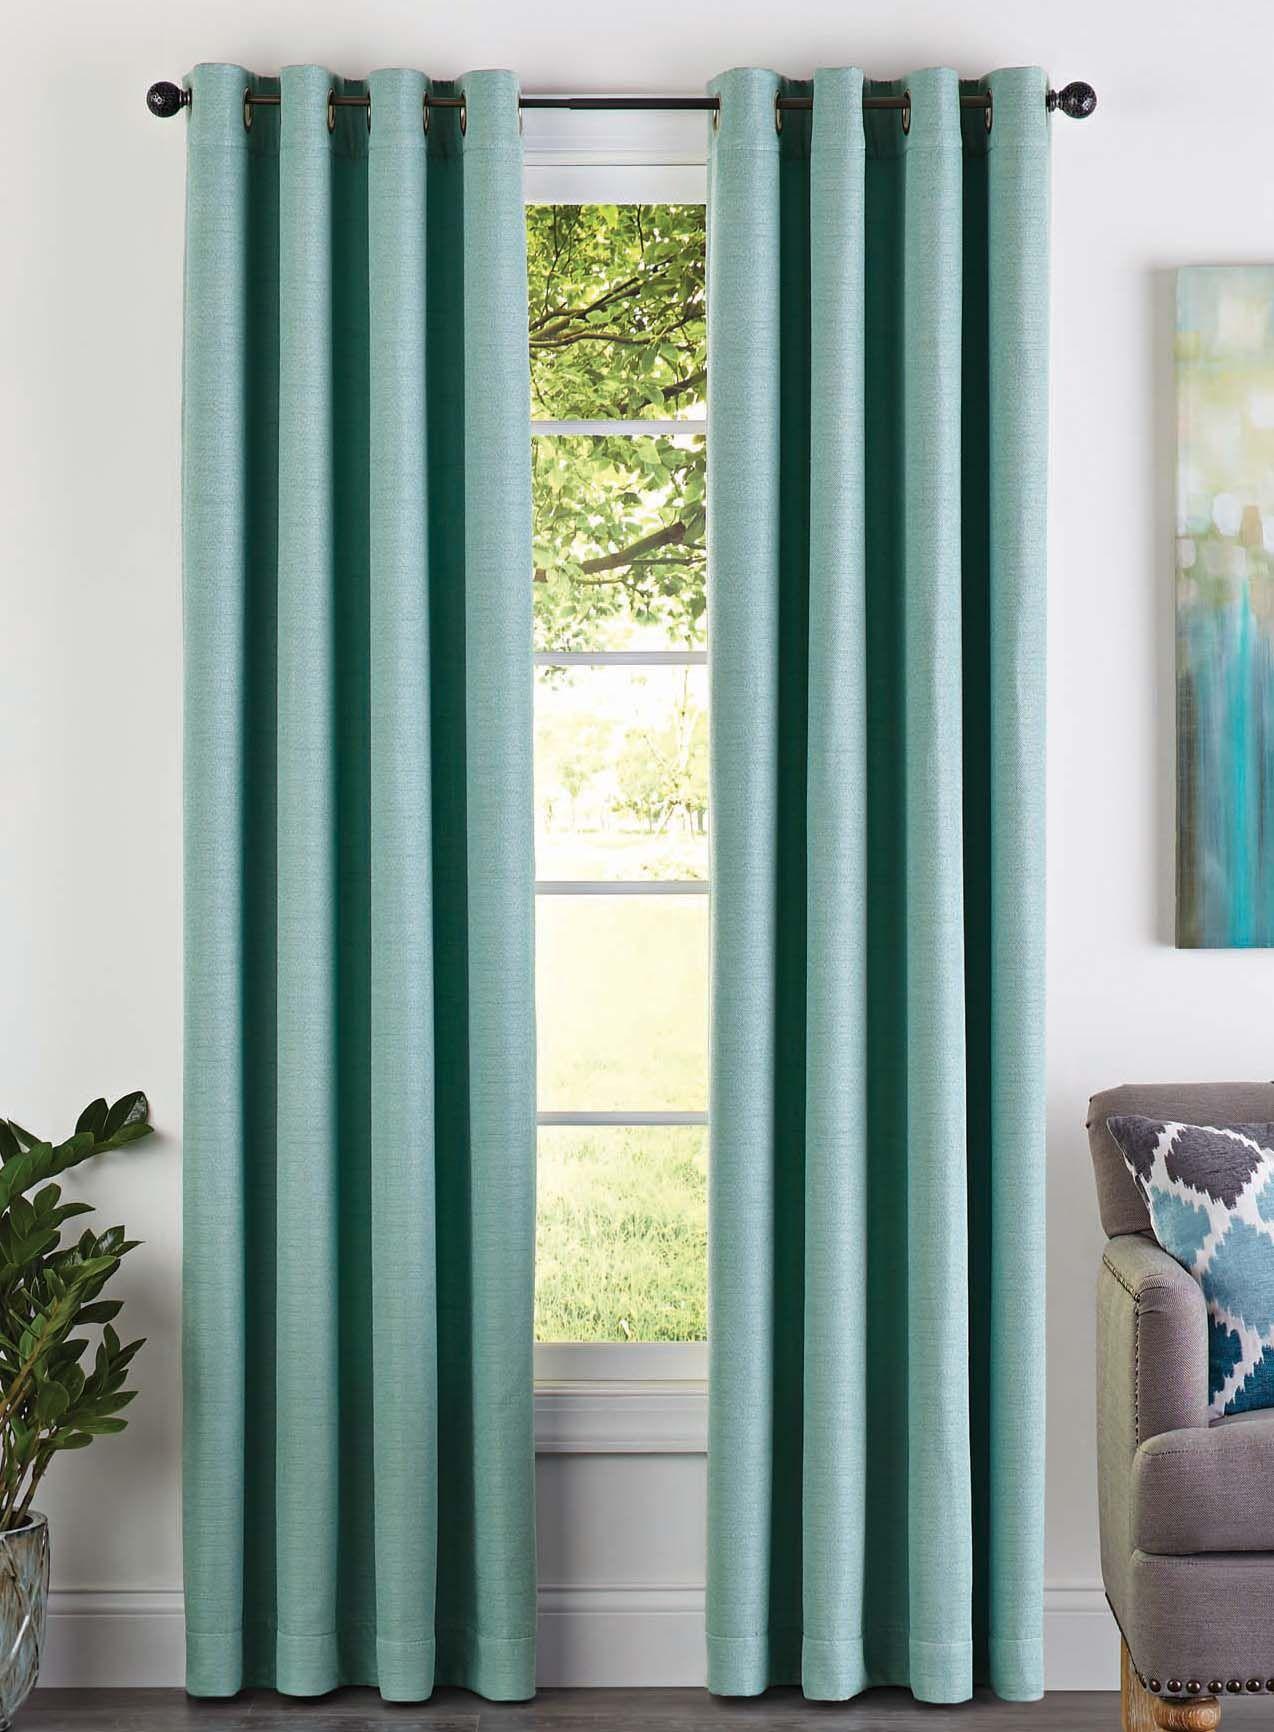 ede957cb55bf1ec89b15add74e0be132 - Better Homes And Gardens Basketweave Curtain Panel Aqua